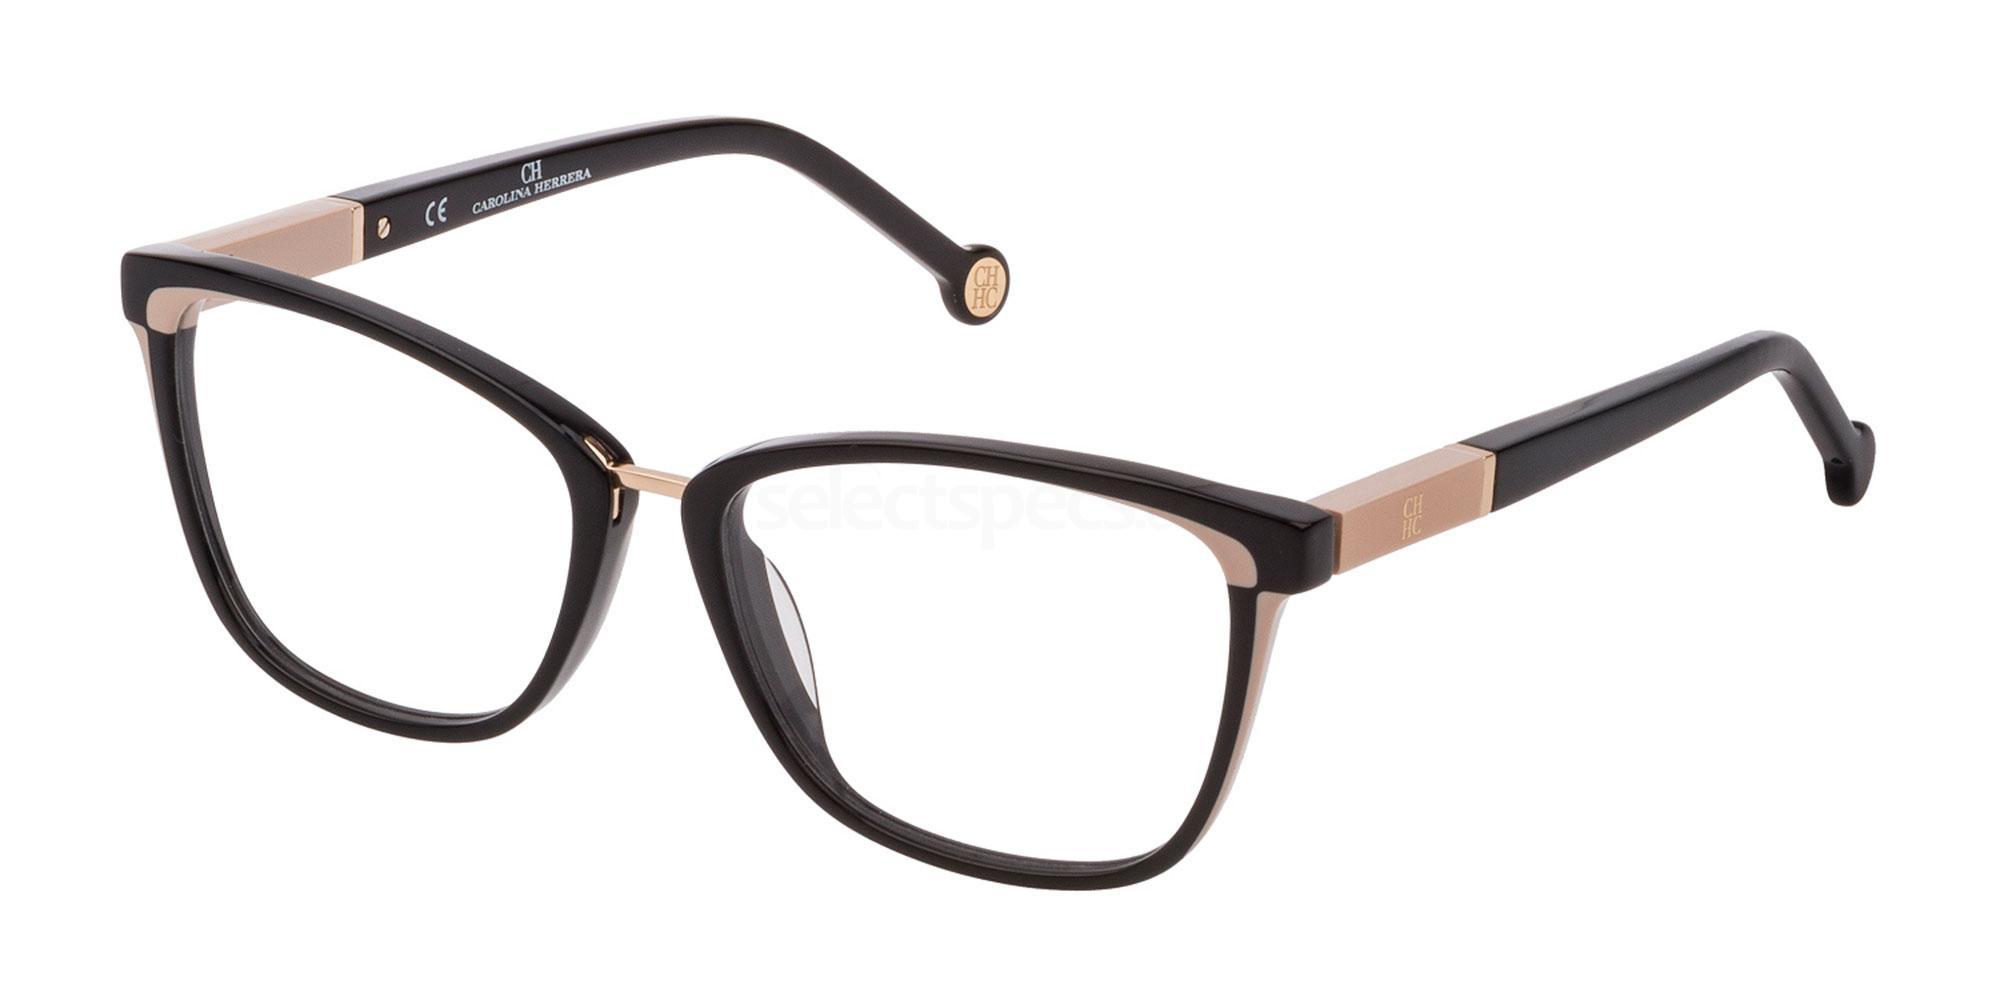 0700 VHE814 Glasses, CH Carolina Herrera